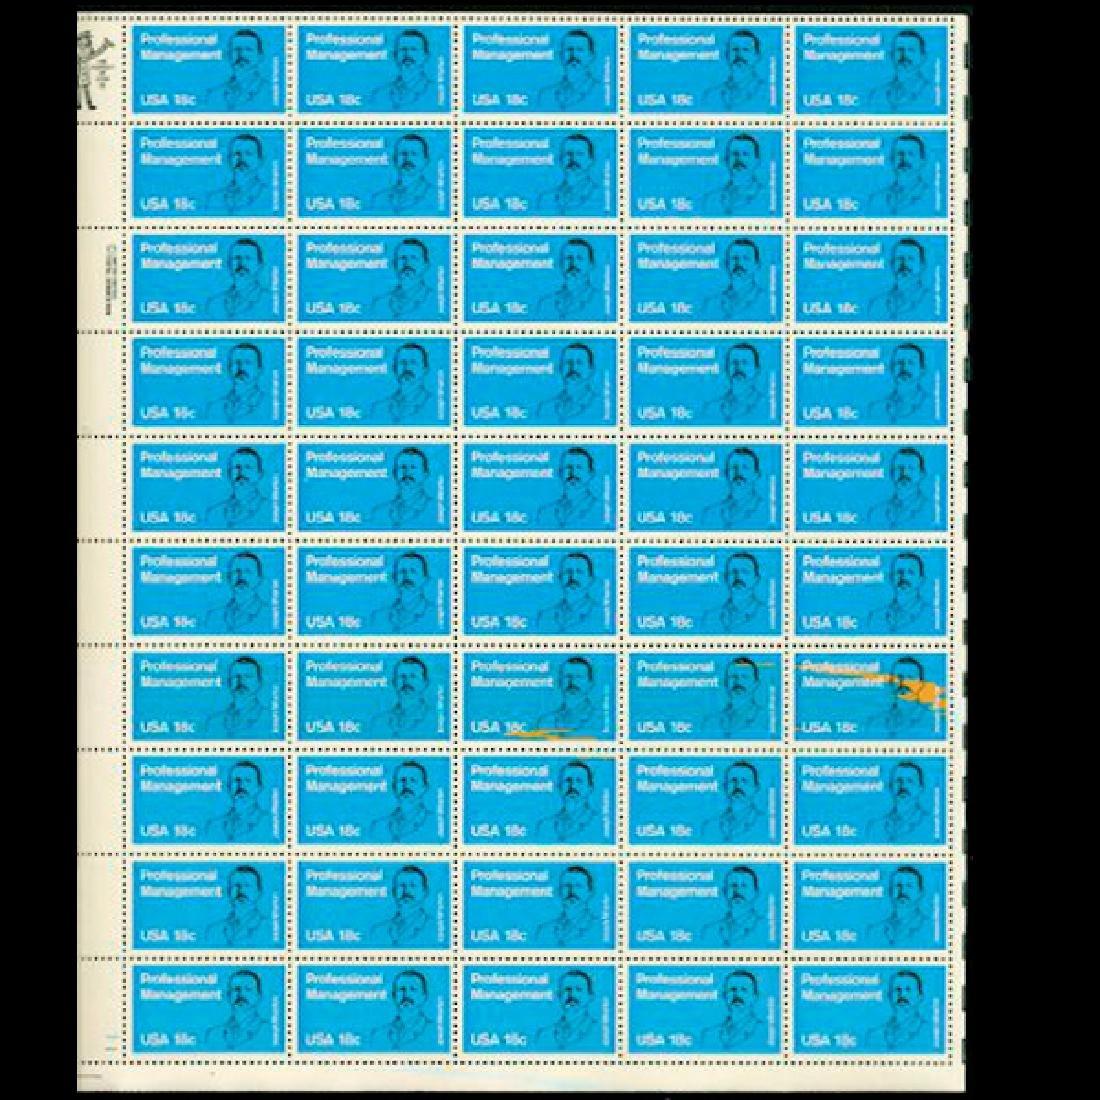 1981 US Sheet 18c Professional Management Stamps MNH